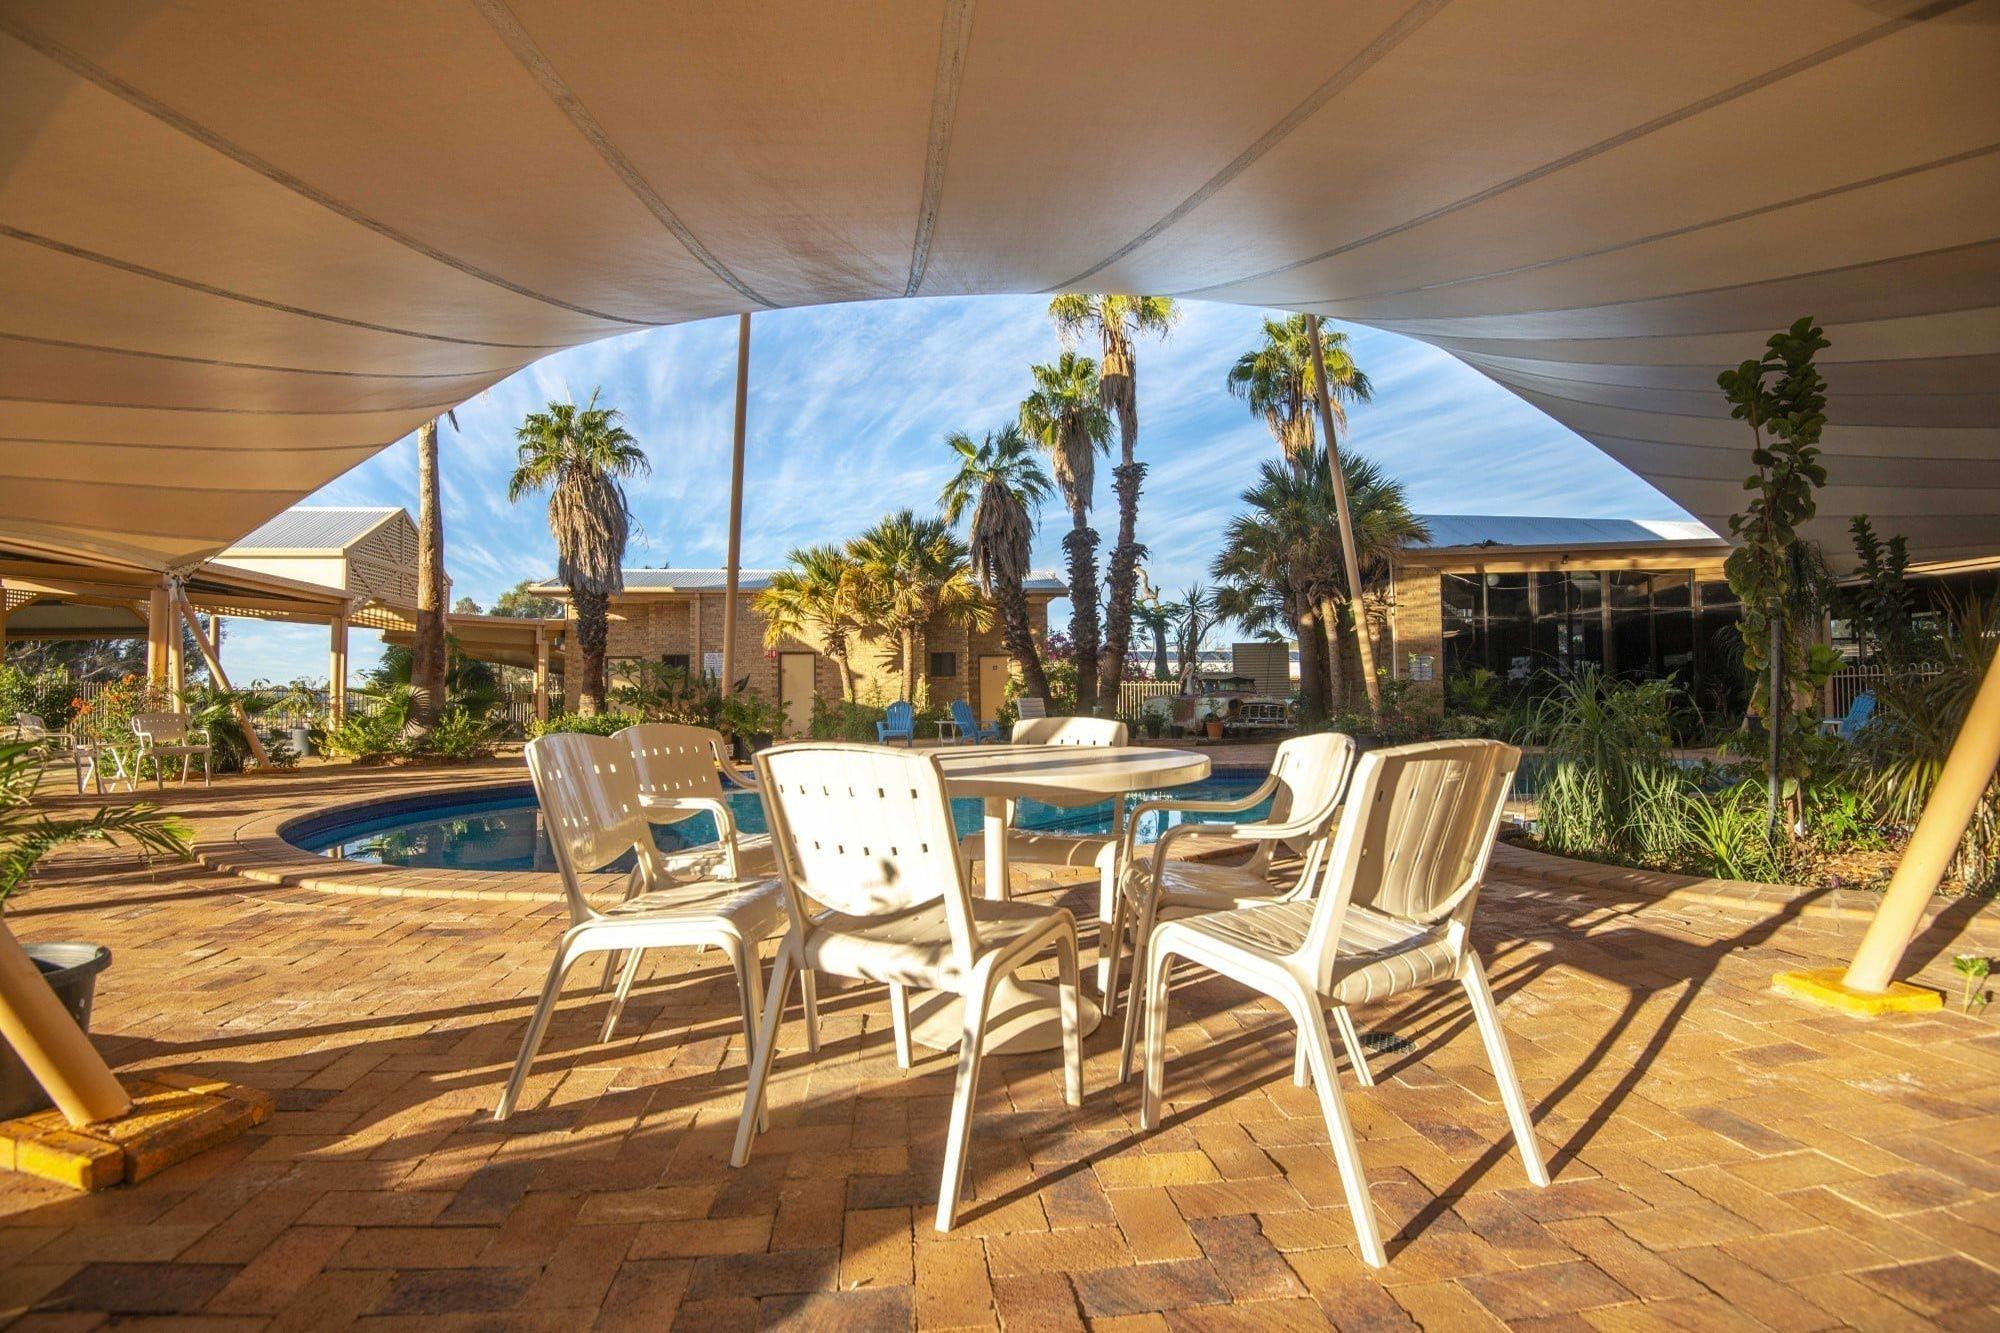 longreach-motel-facilities (24)